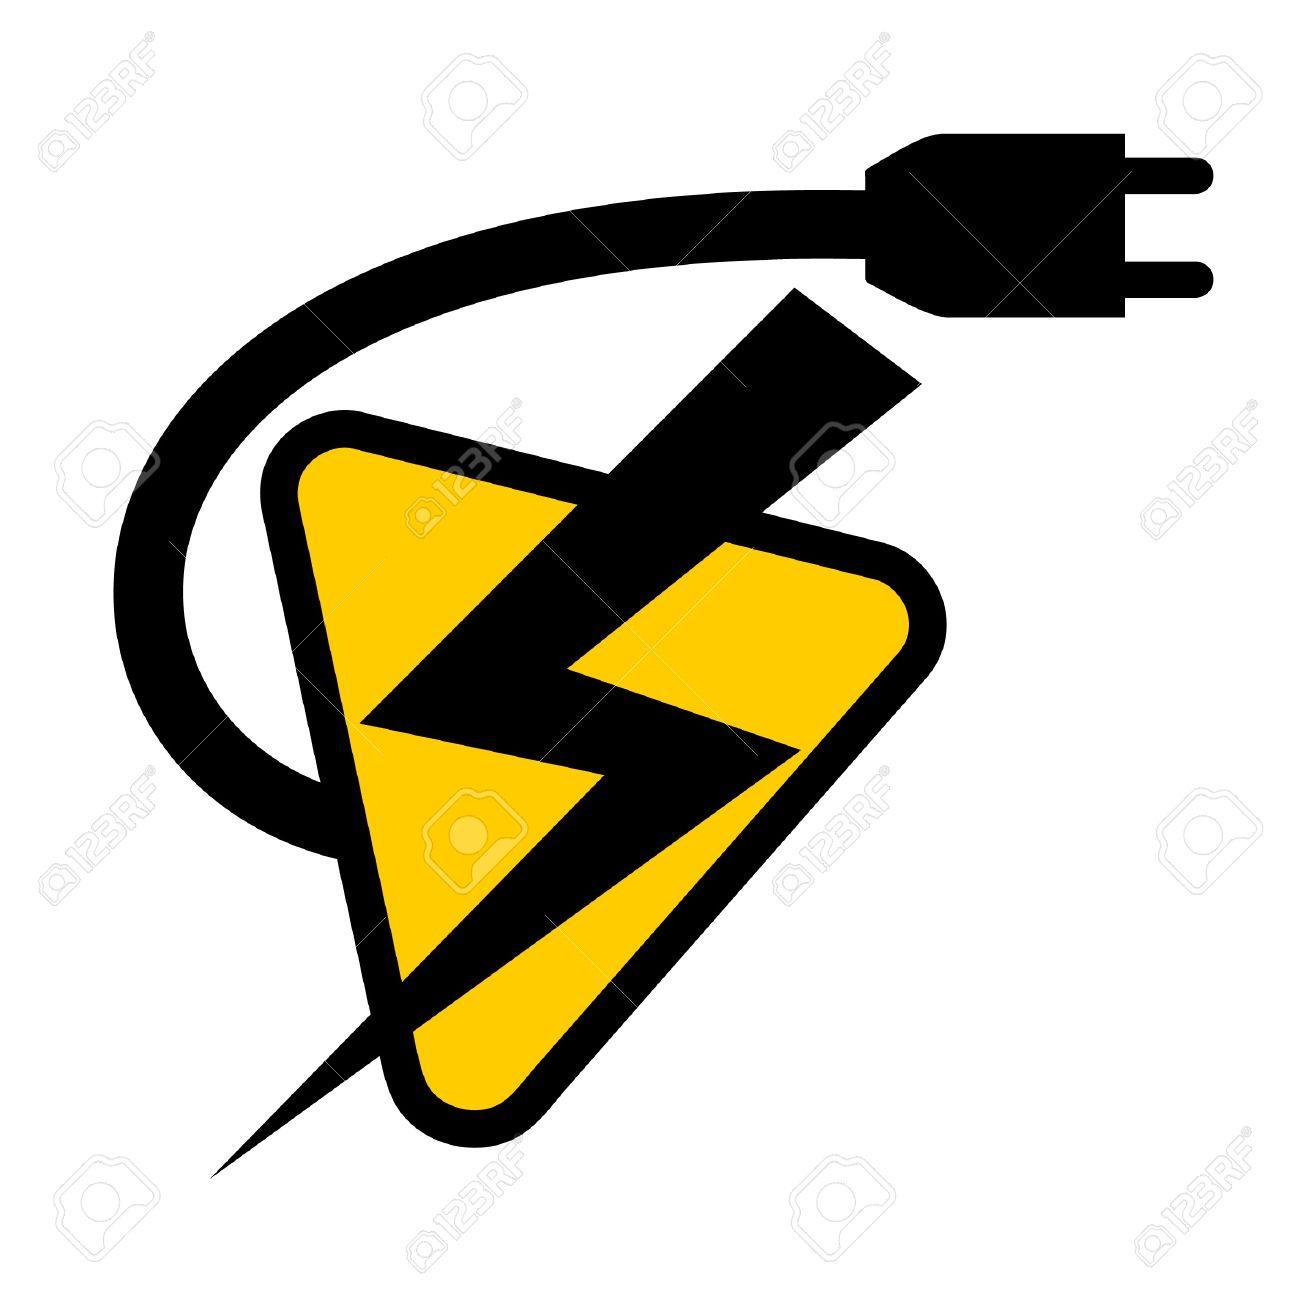 Battery symbol Stock Vector - 11573519